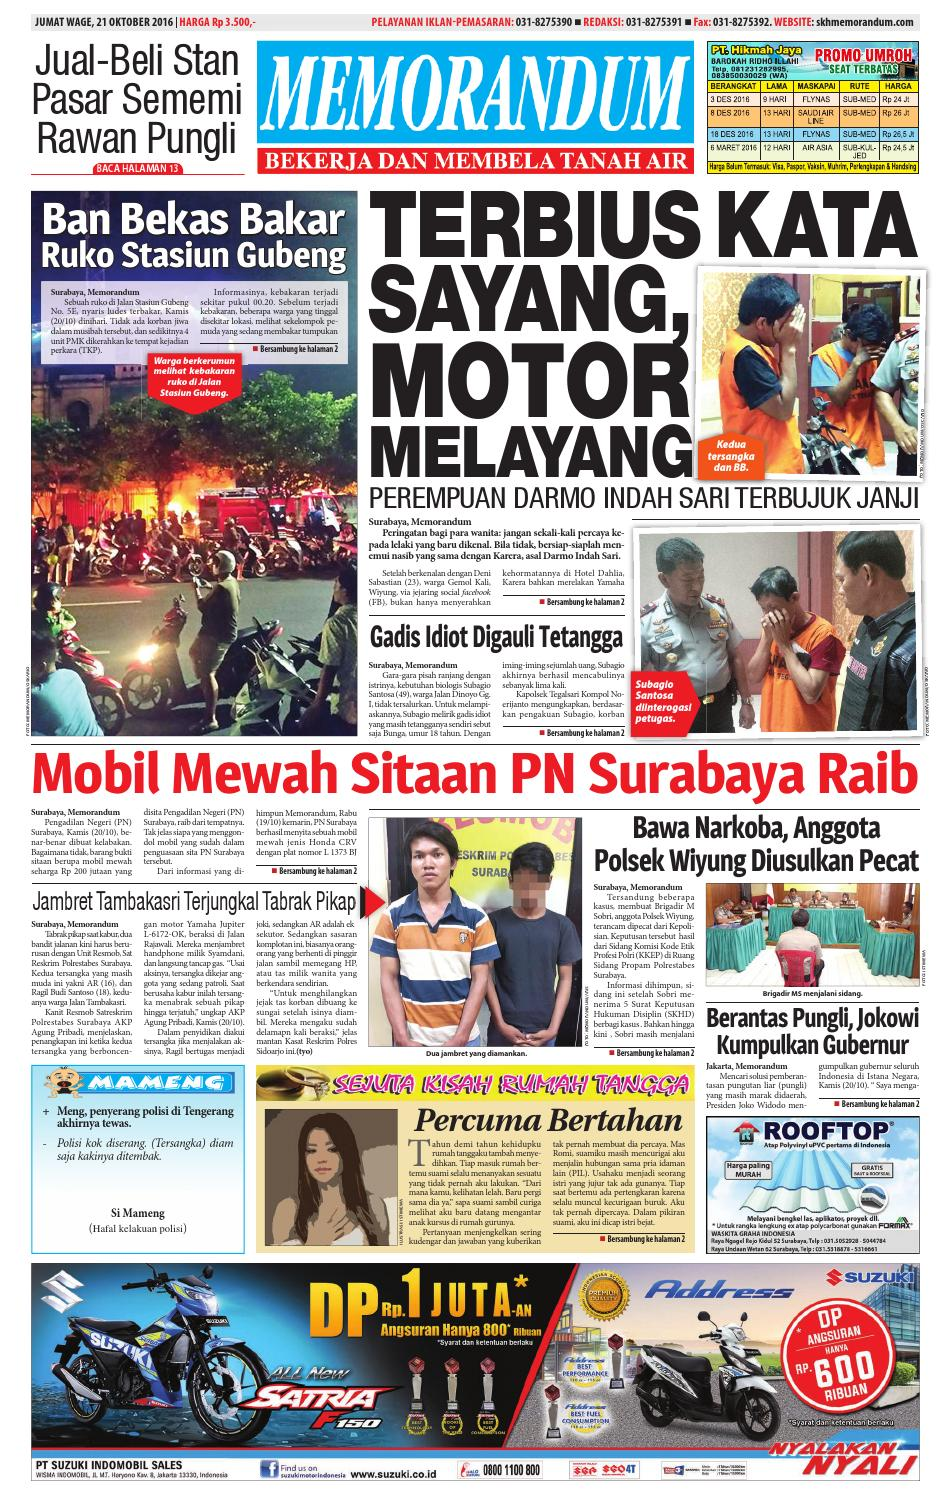 memorandum edisi 21 oktober 2016 by memorandum issuu